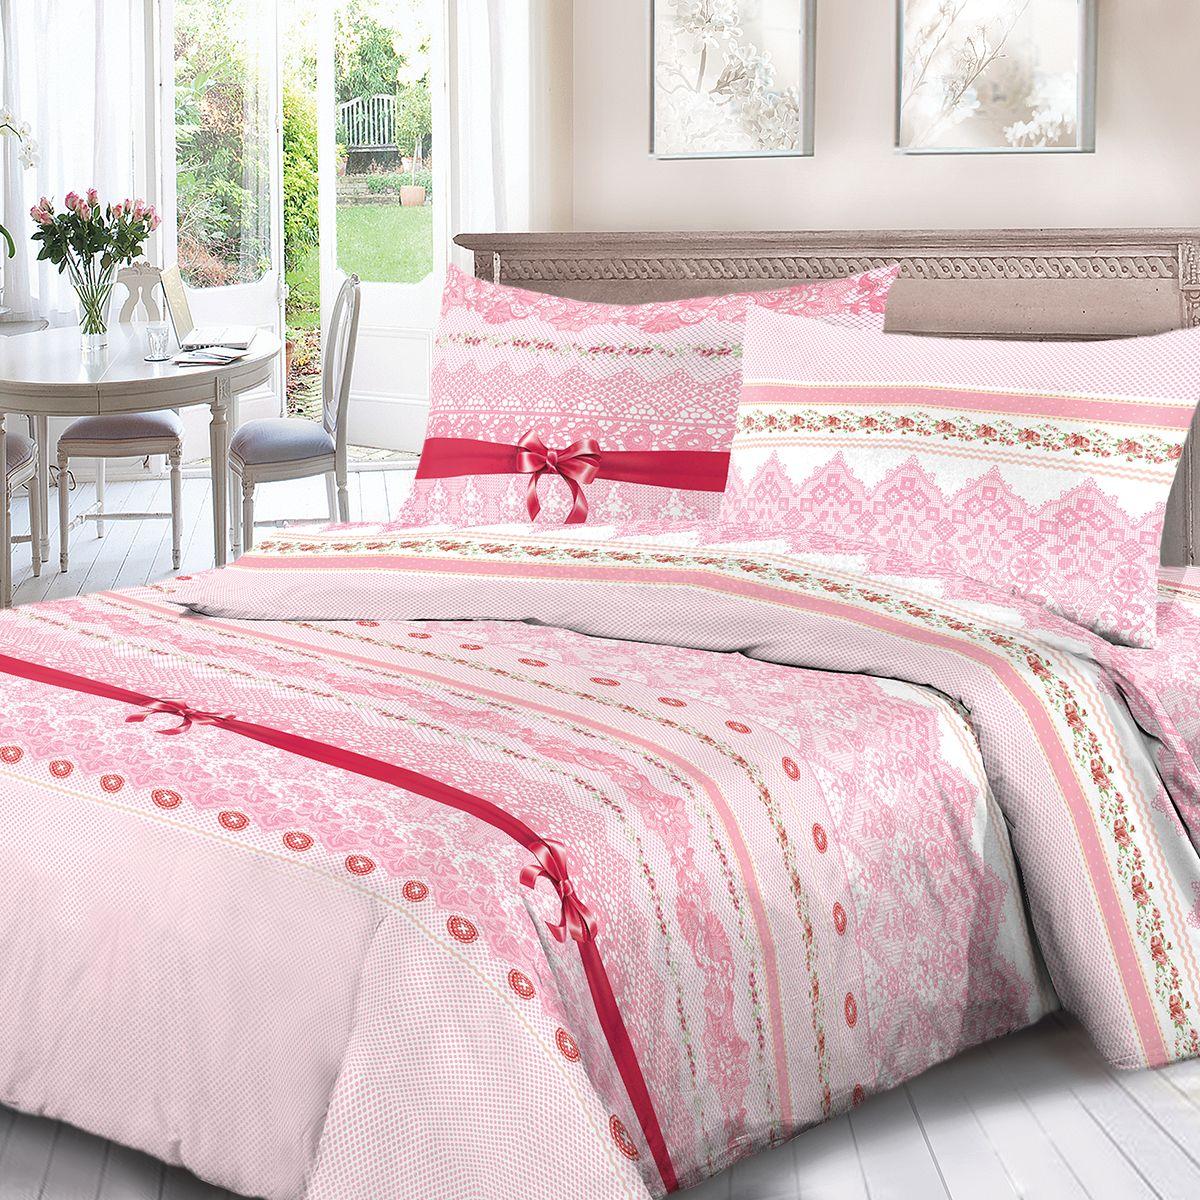 Комплект белья Для Снов Бал, евро, наволочки 70x70, цвет: розовый. 4062-183527